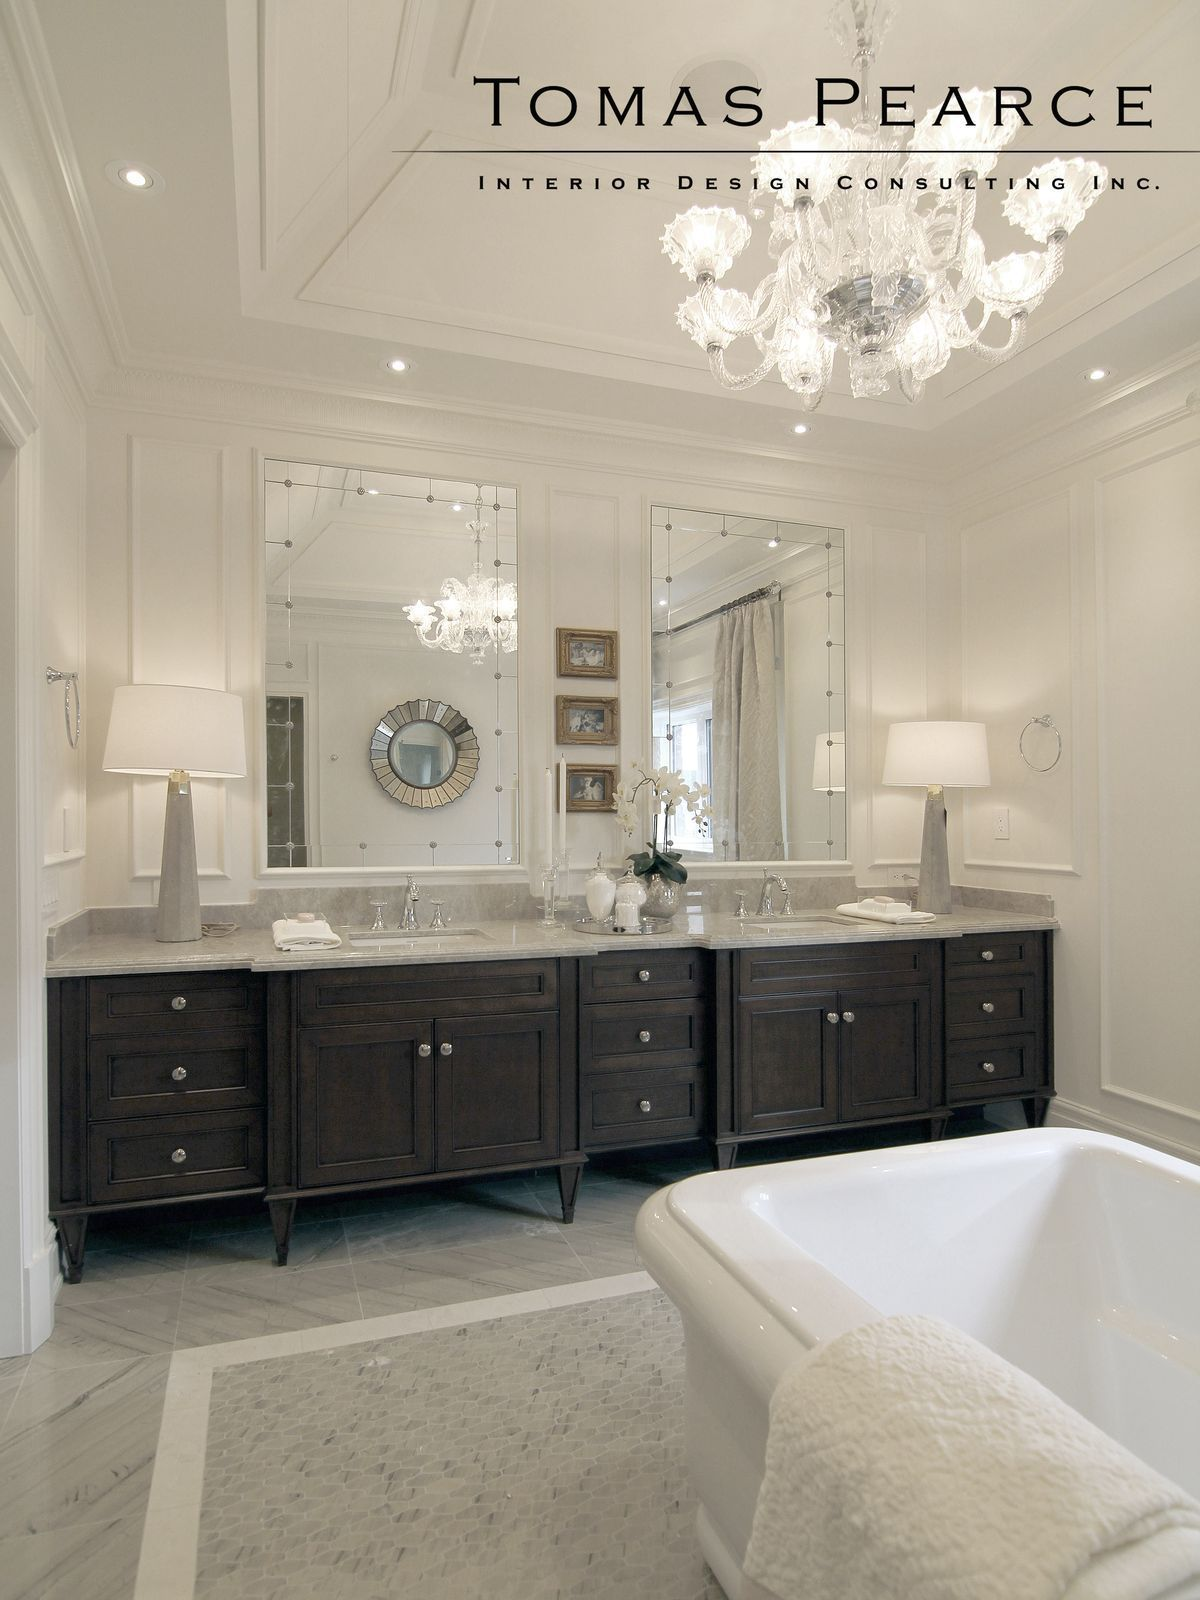 26 Ultramodern Luxury Bathroom Designs  Bathroom Designs Best Pictures Of Luxury Bathrooms Decorating Inspiration